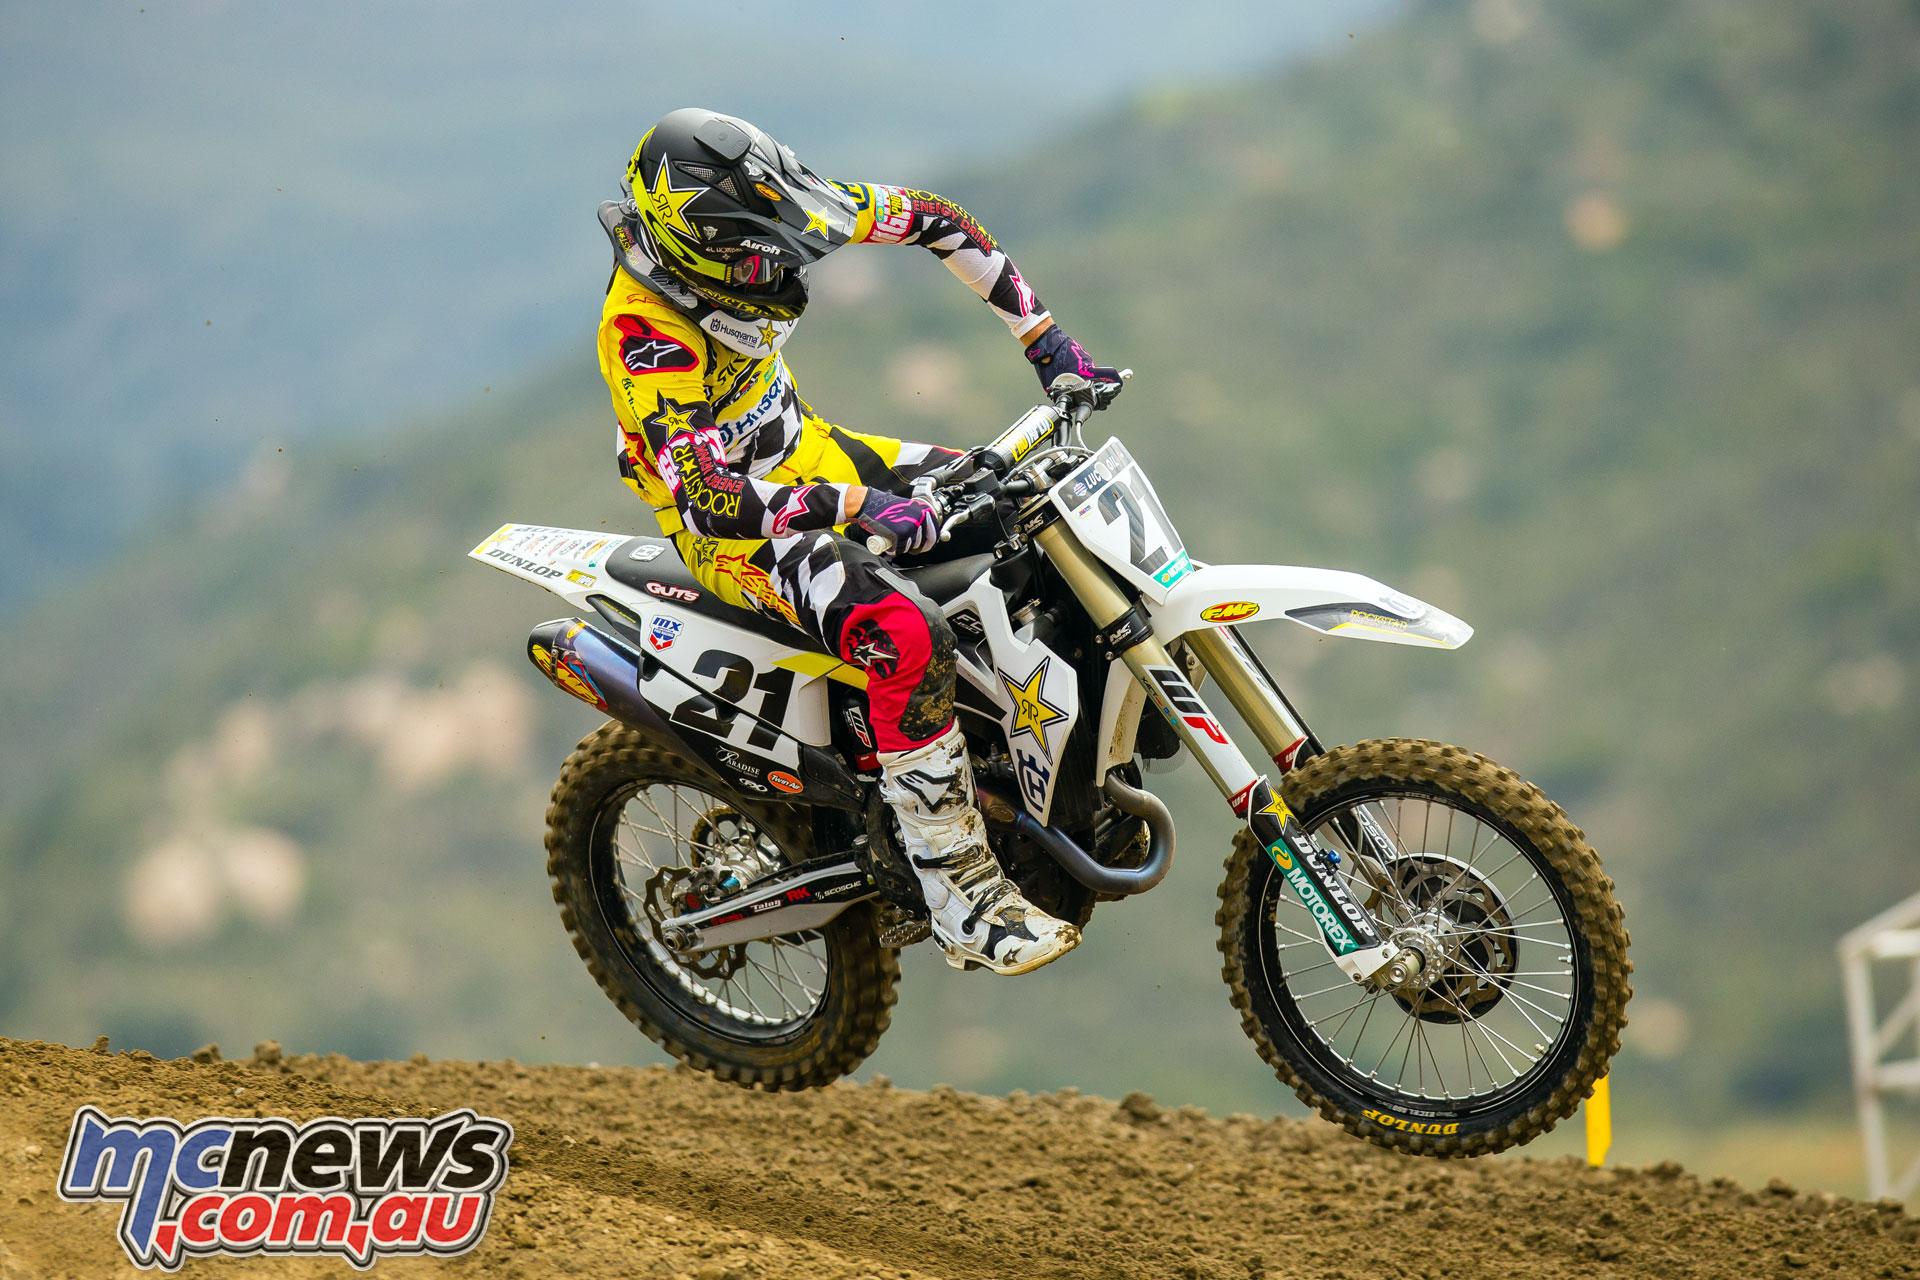 AMA Pro MX Rnd FoxRaceway Anderson JK MX Pala